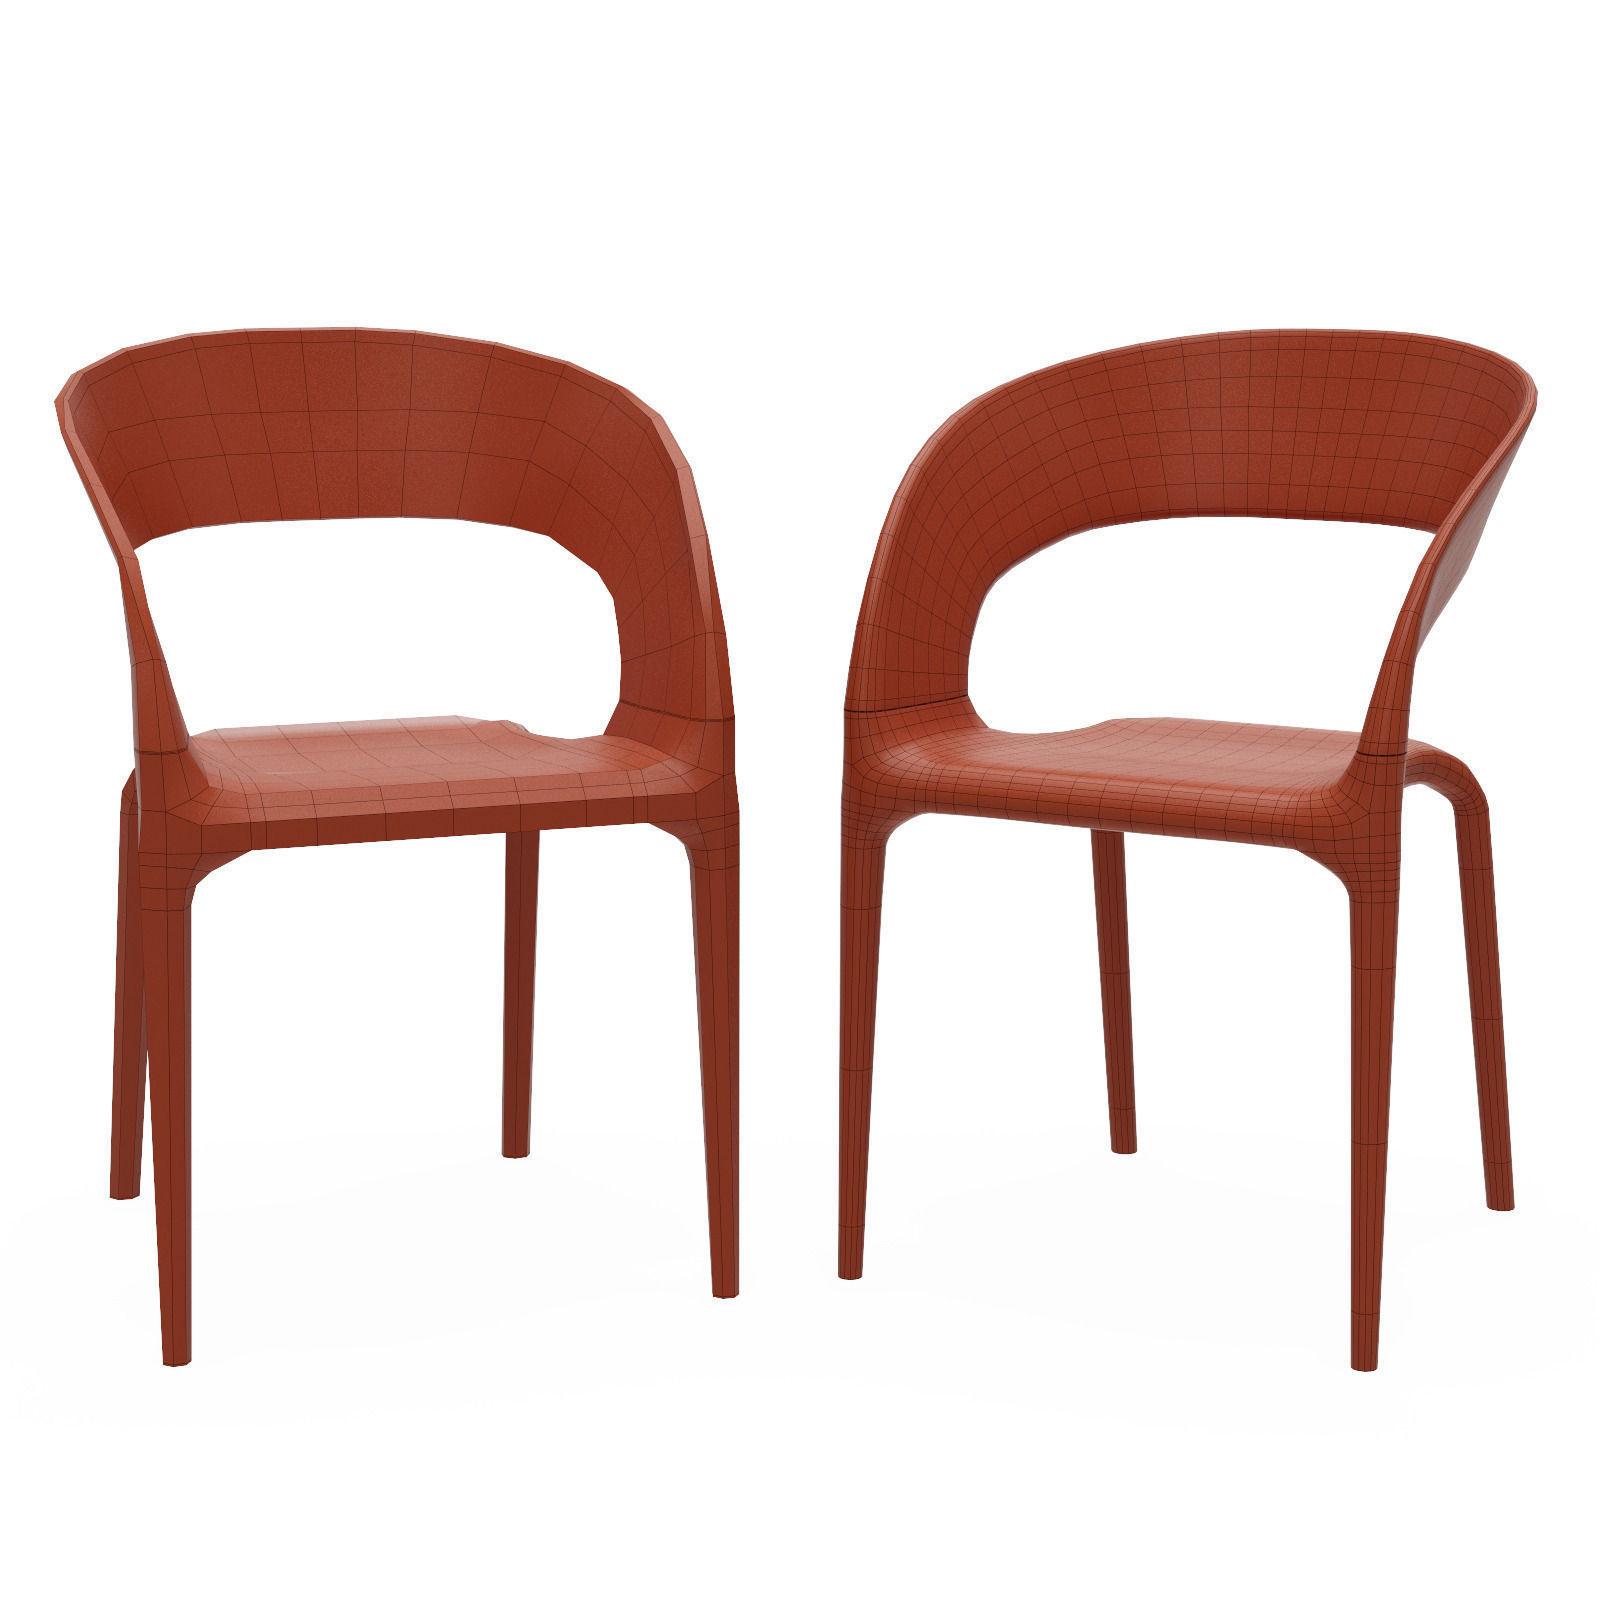 ... Driade Ring Chair 3d Model Max Obj Mtl 3ds Fbx 8